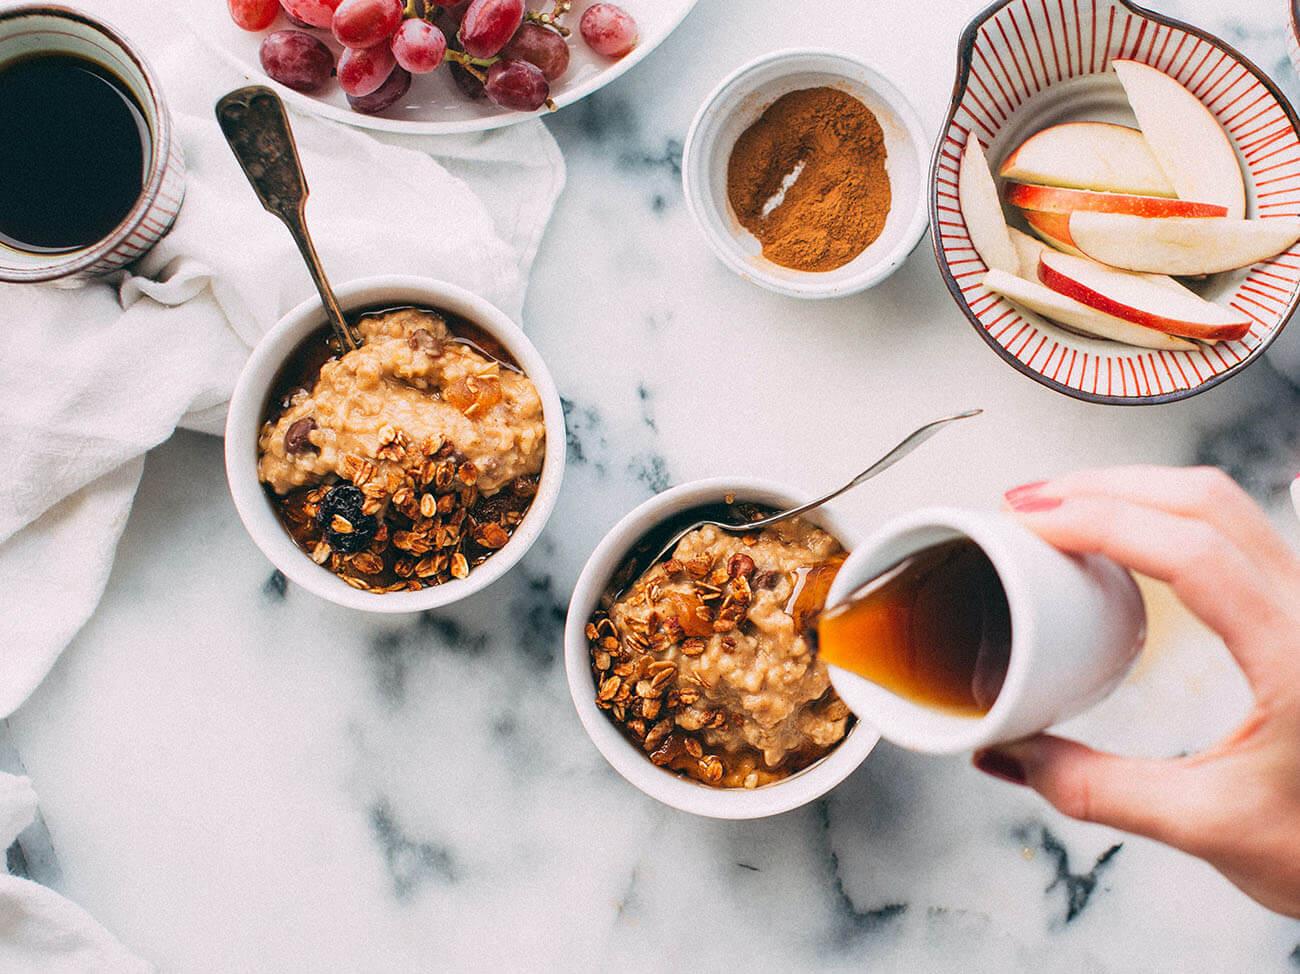 Frau gießt Sirup zum Porridge zum Fruestueck